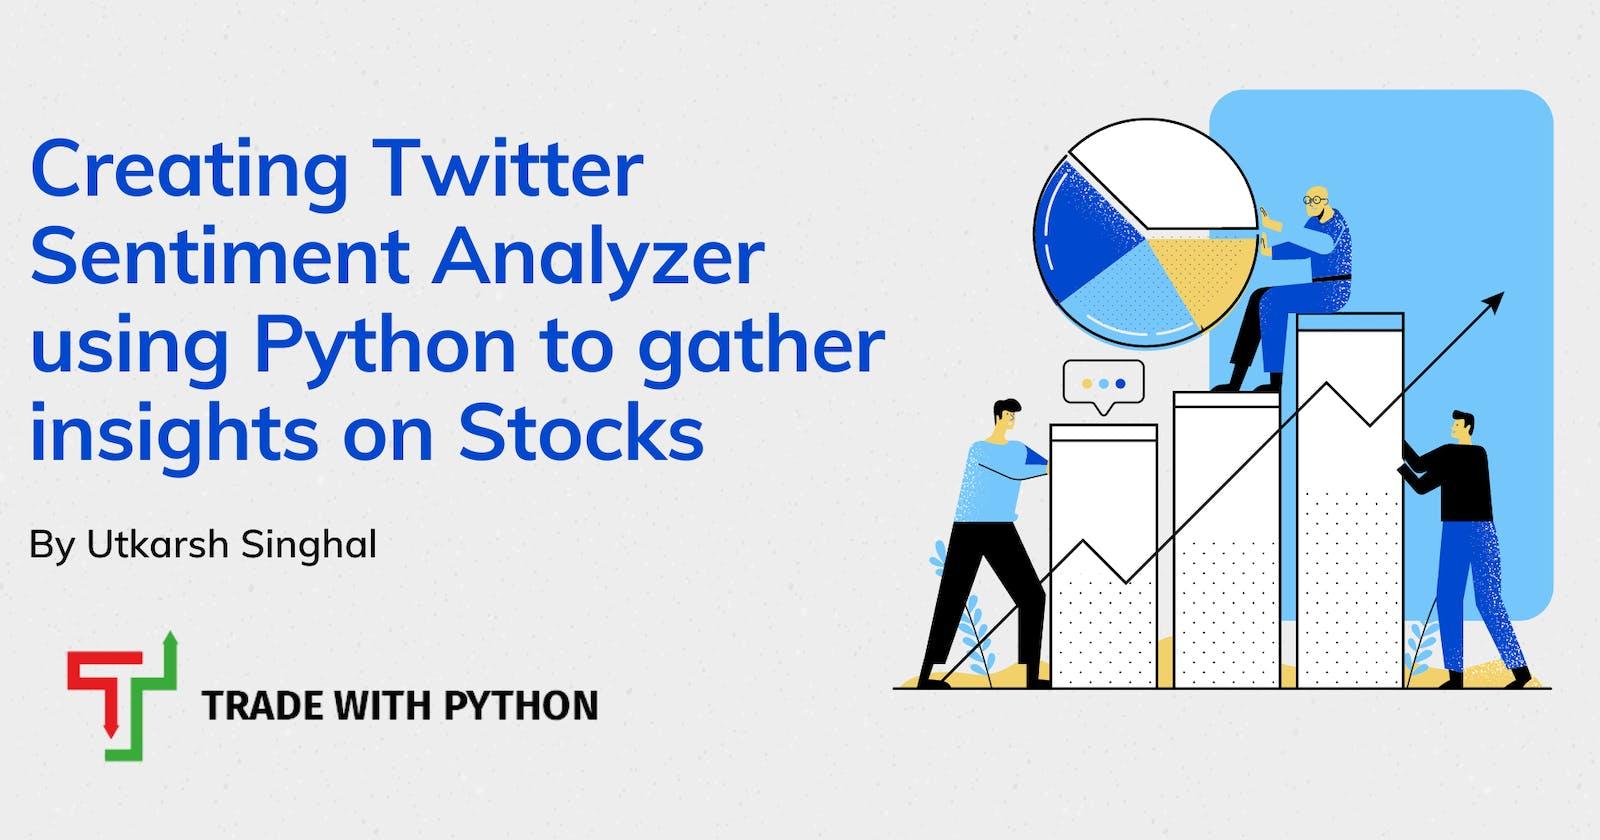 Creating Twitter Sentiment Analyzer using Python to gather insights on Stocks